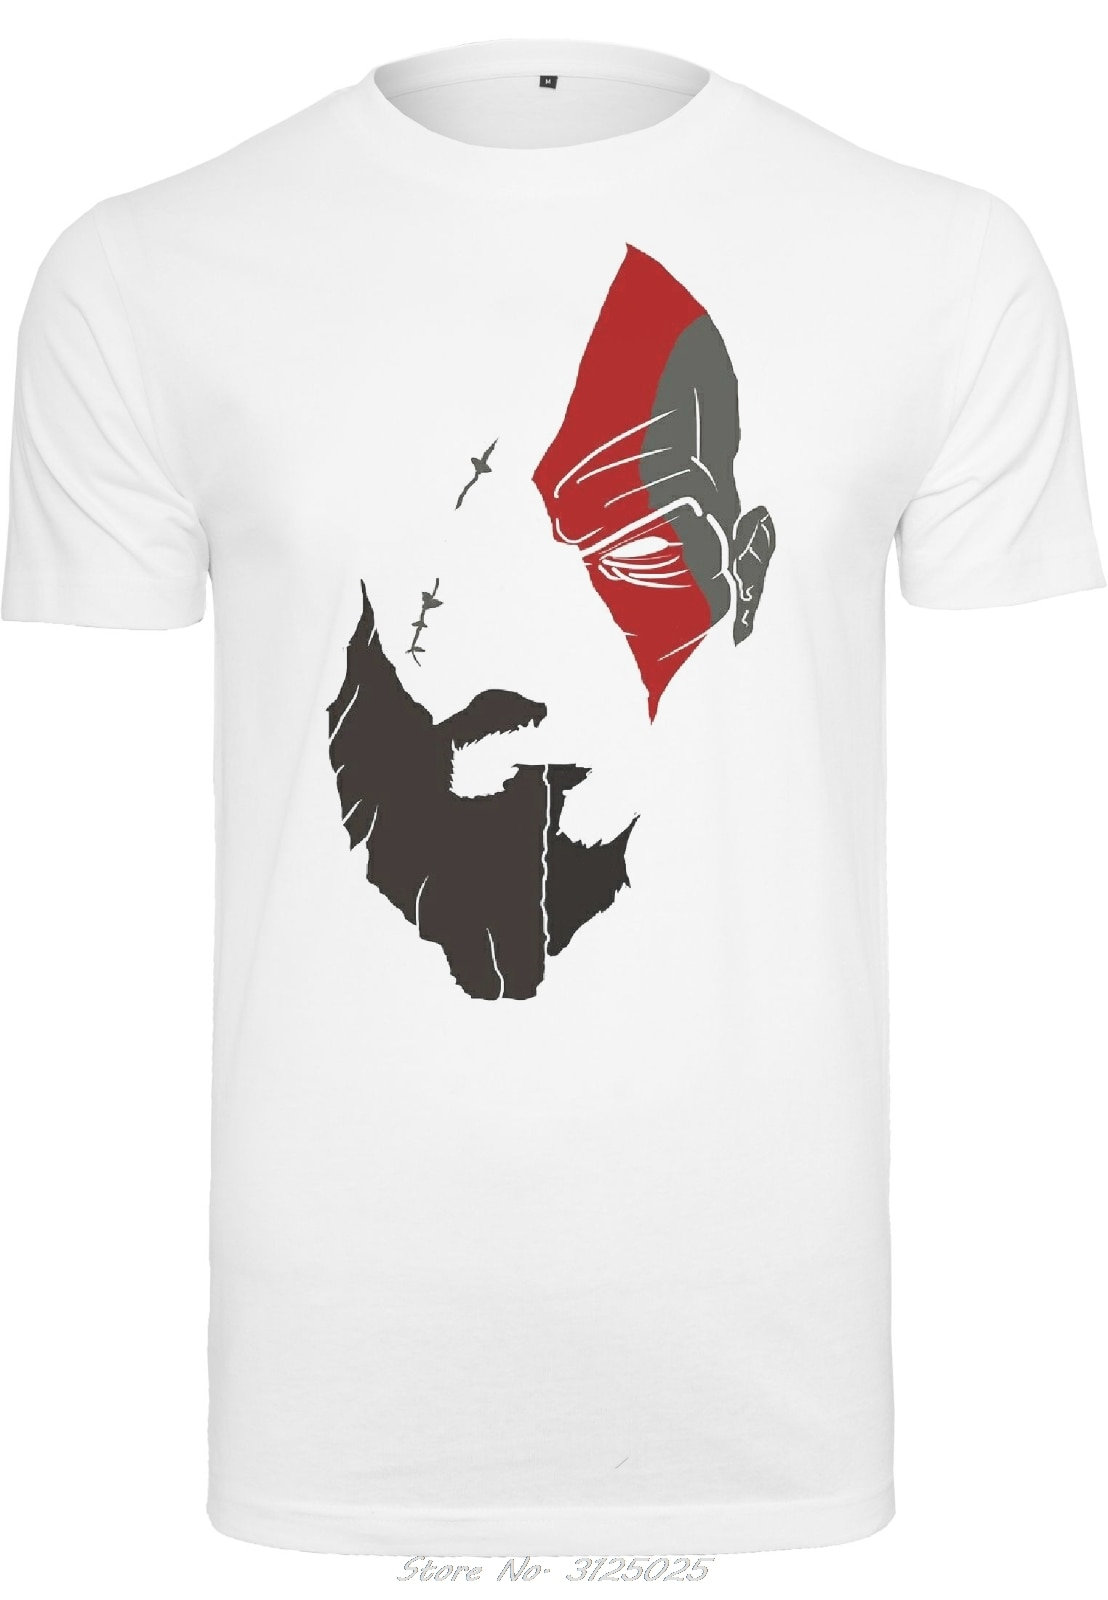 Camiseta de God Of War Kratos Herren para hombre, ropa informal de orgullo, camiseta de moda Unisex, camisetas de algodón para hombre, ropa de calle